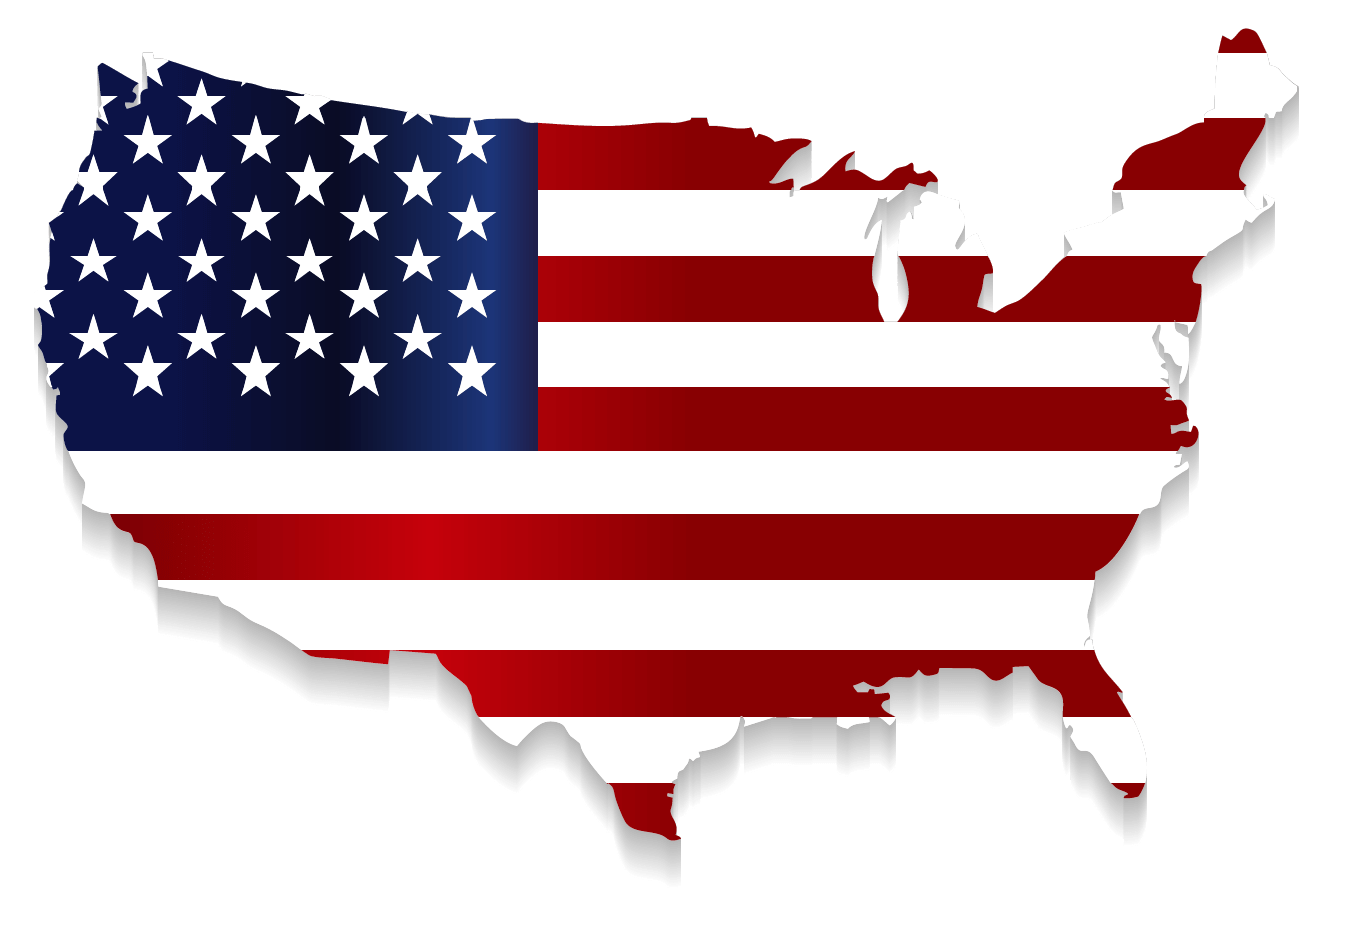 https://myscs.org/wp-content/uploads/2021/09/USA-01.png